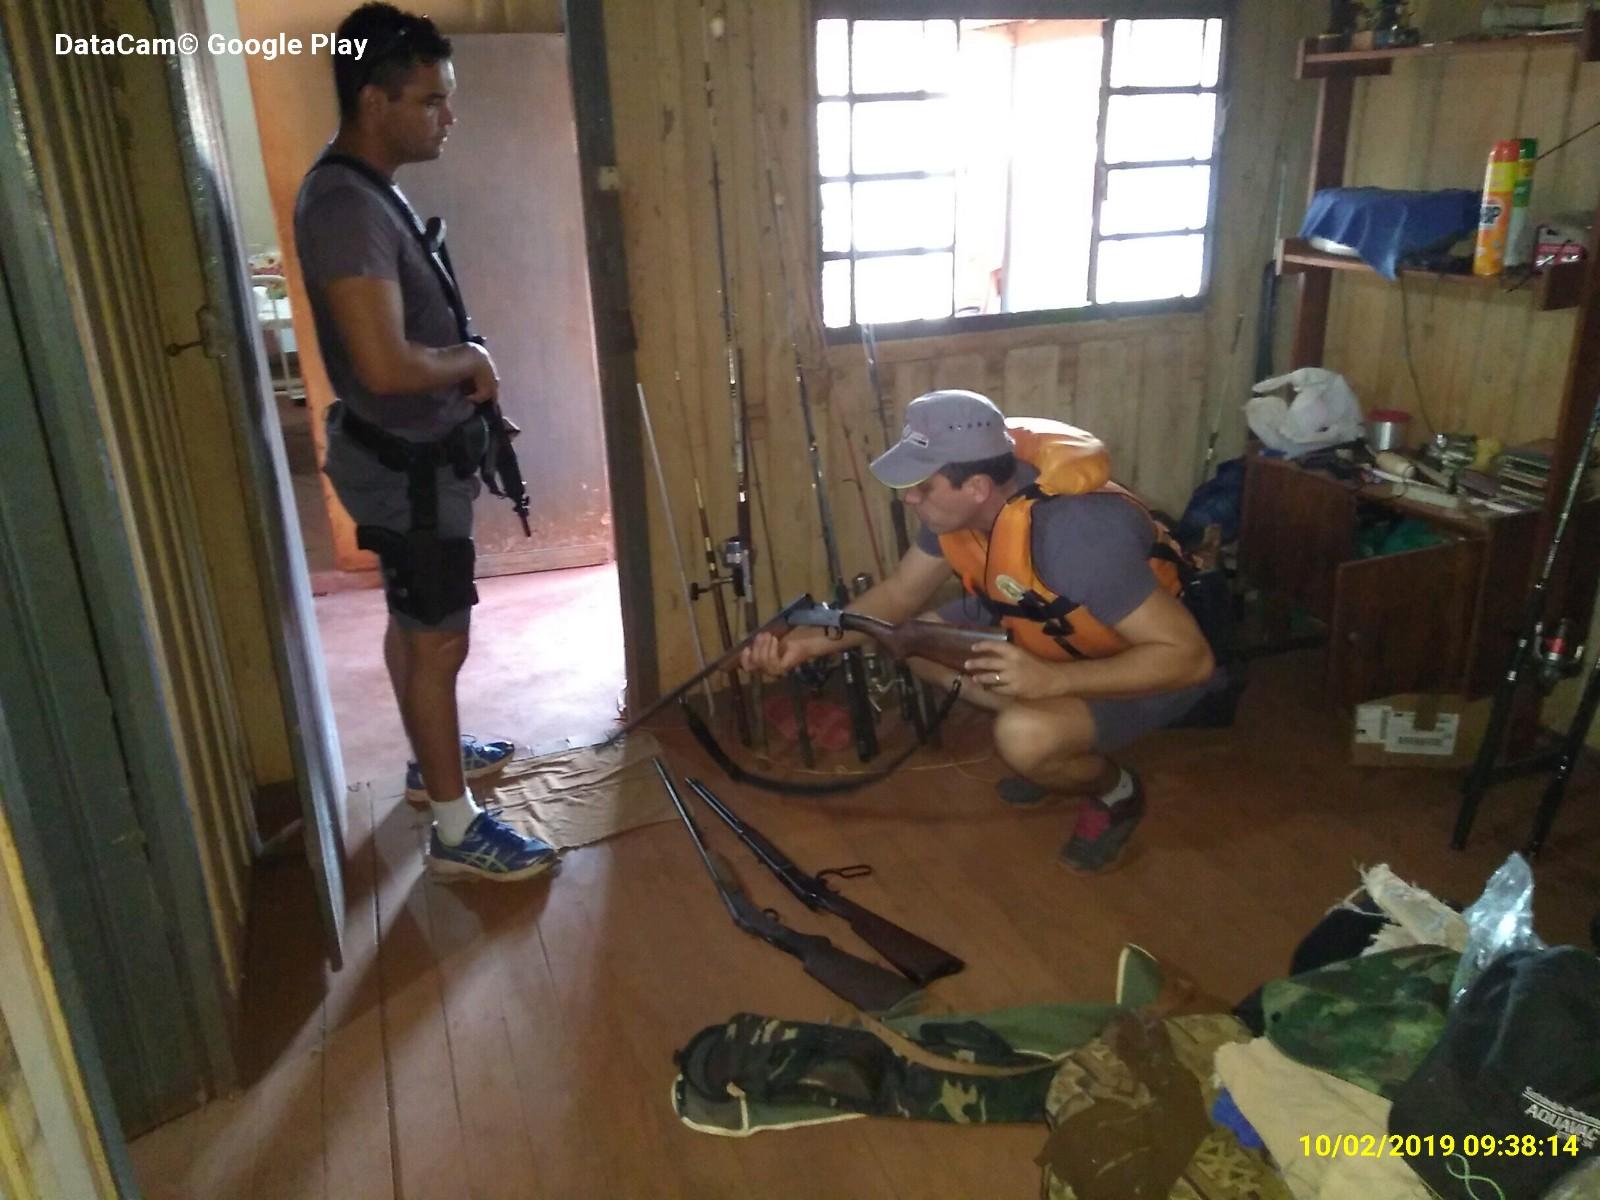 Polícia Ambiental surpreende indivíduo em pesca irregular, apreende armas e carne de capivara